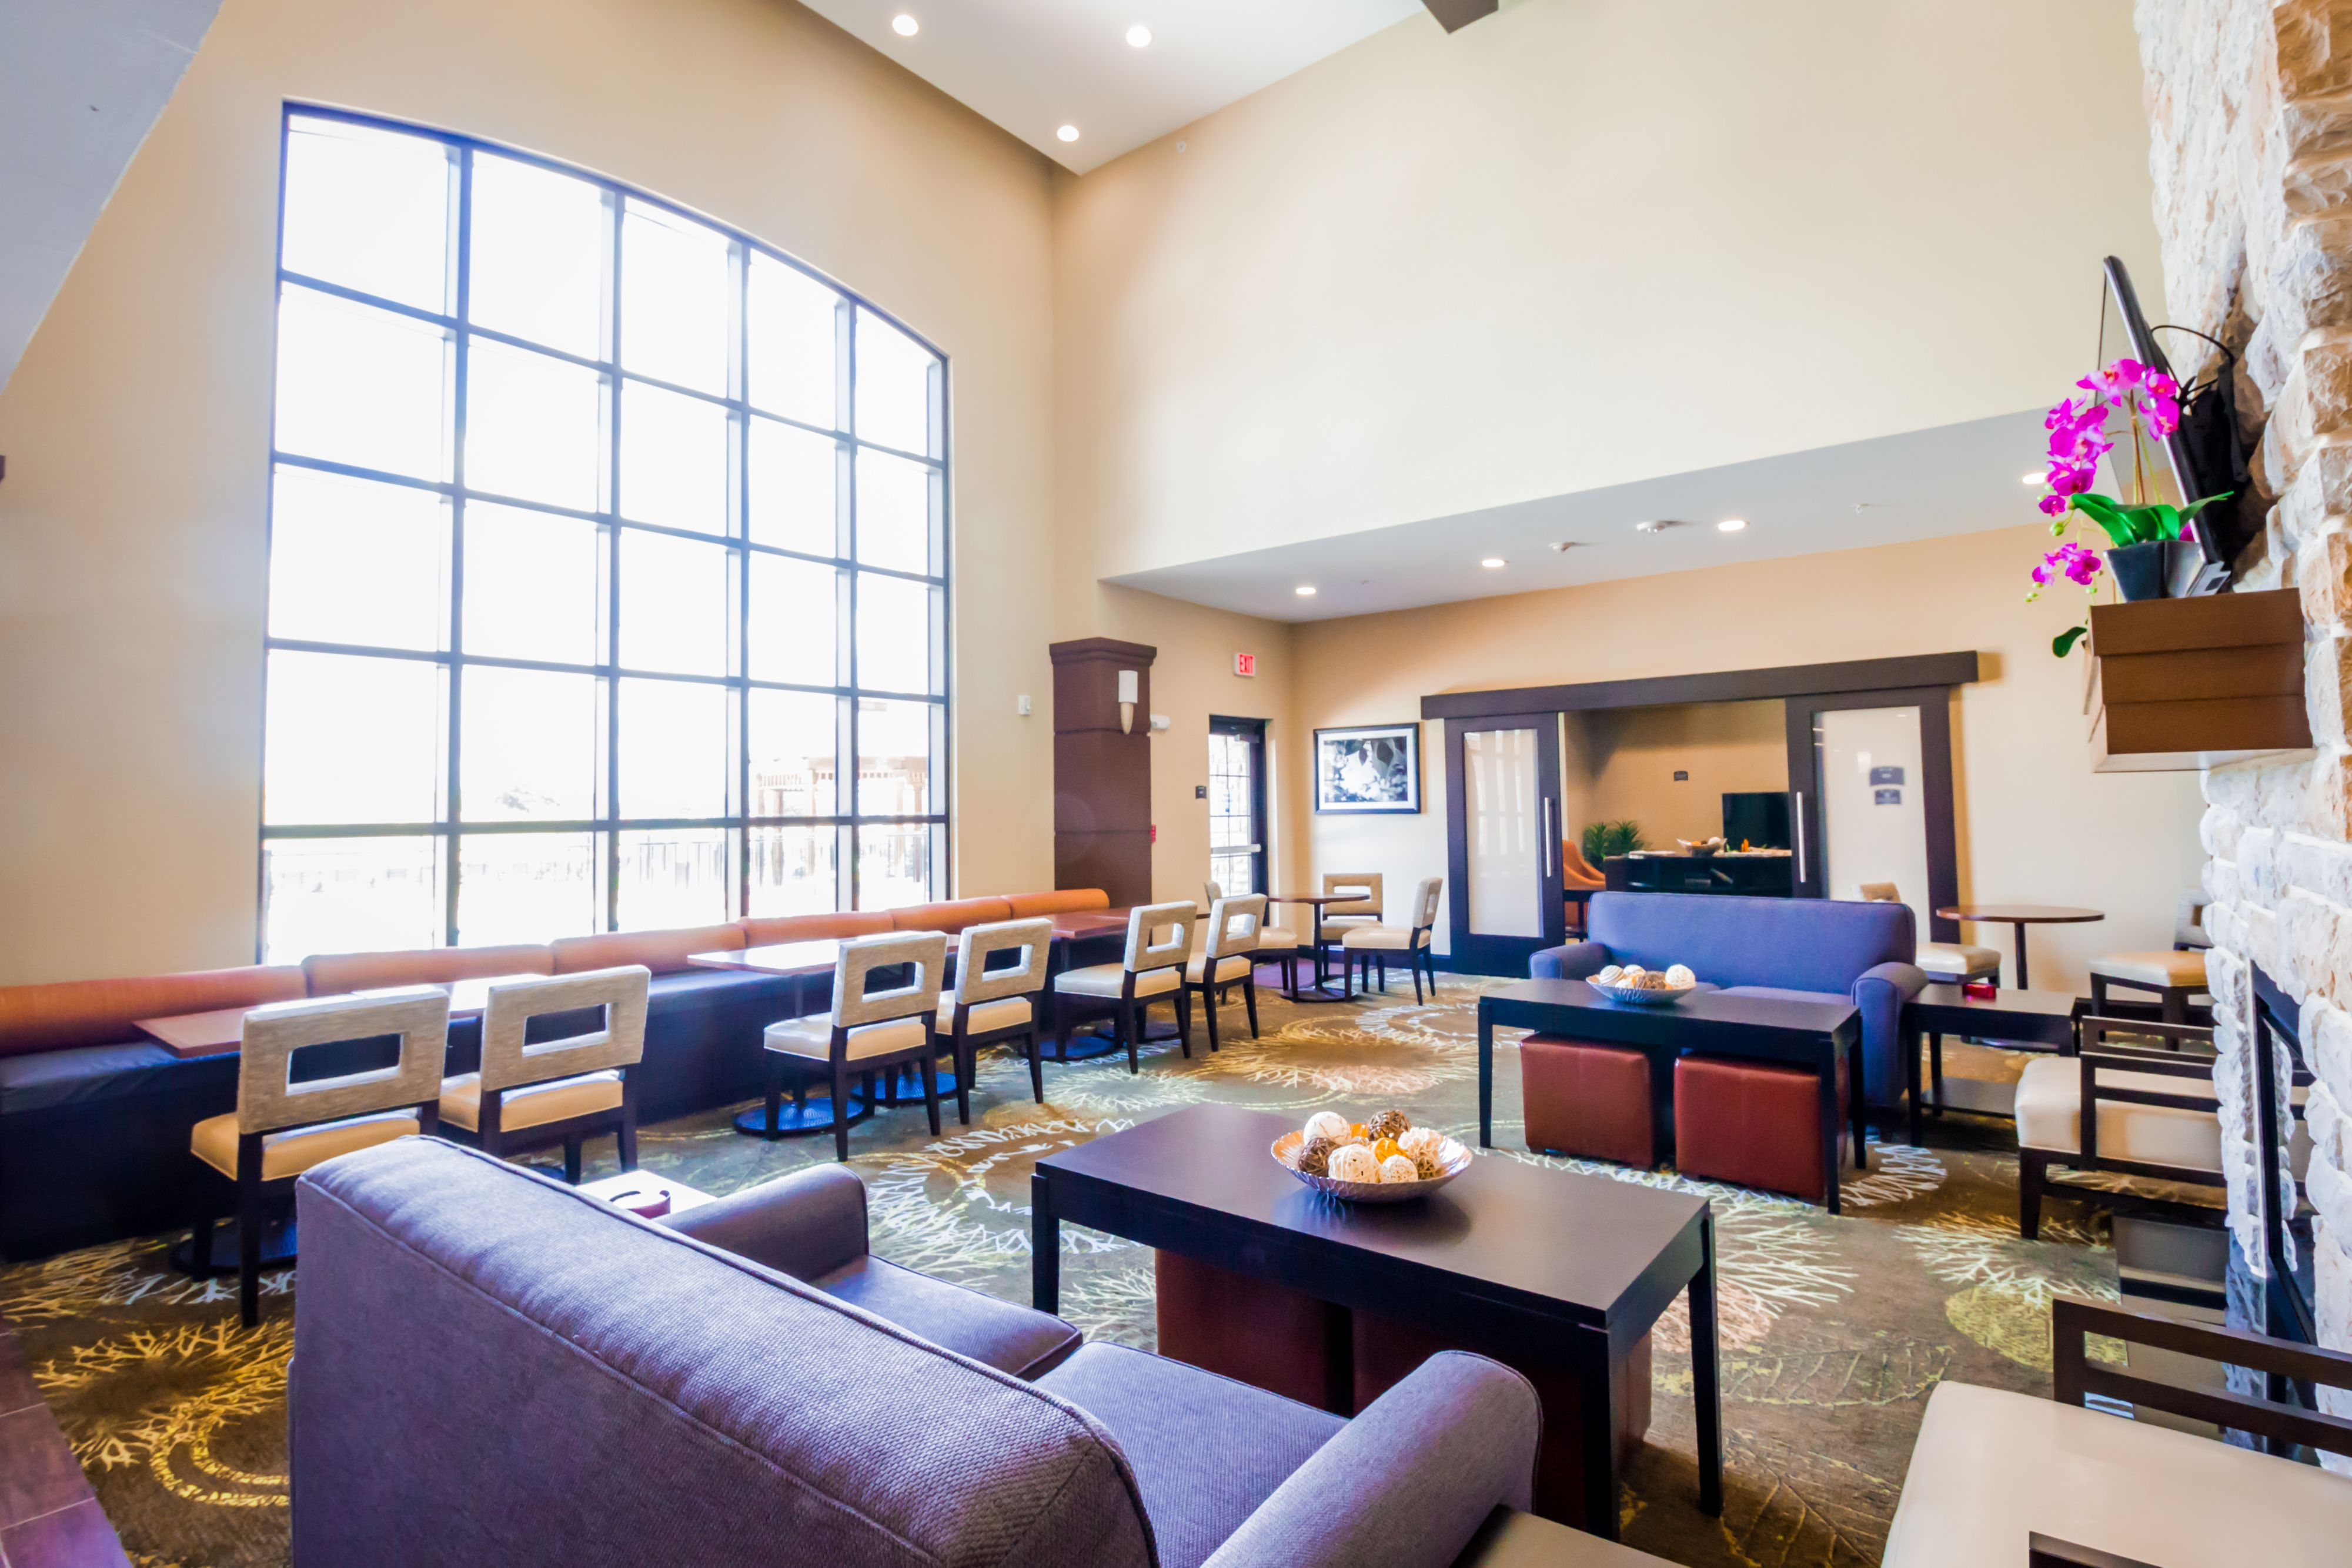 Staybridge Suites Plano Frisco image 7